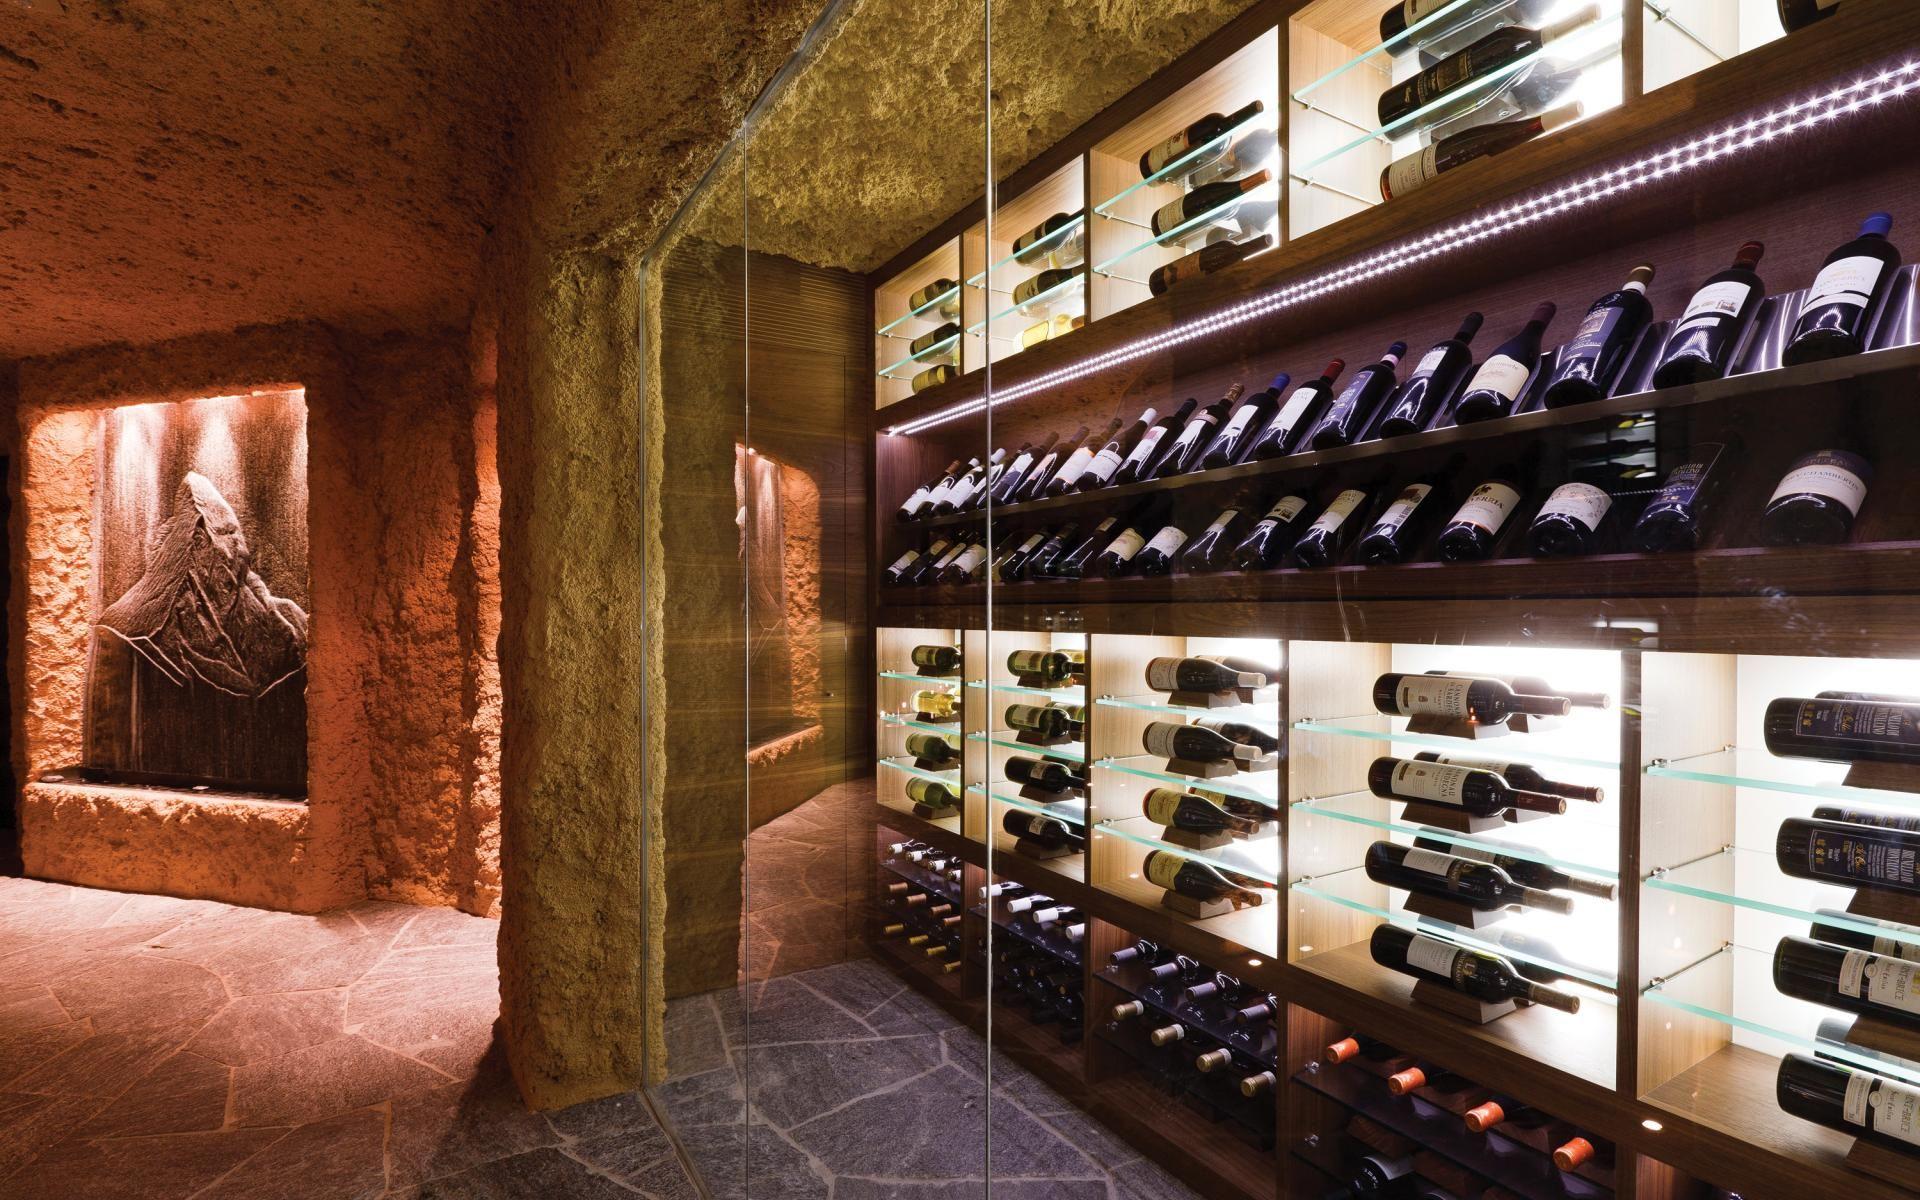 The wine rack at the ultra-luxury ski Chalet Zermatt Peak ...